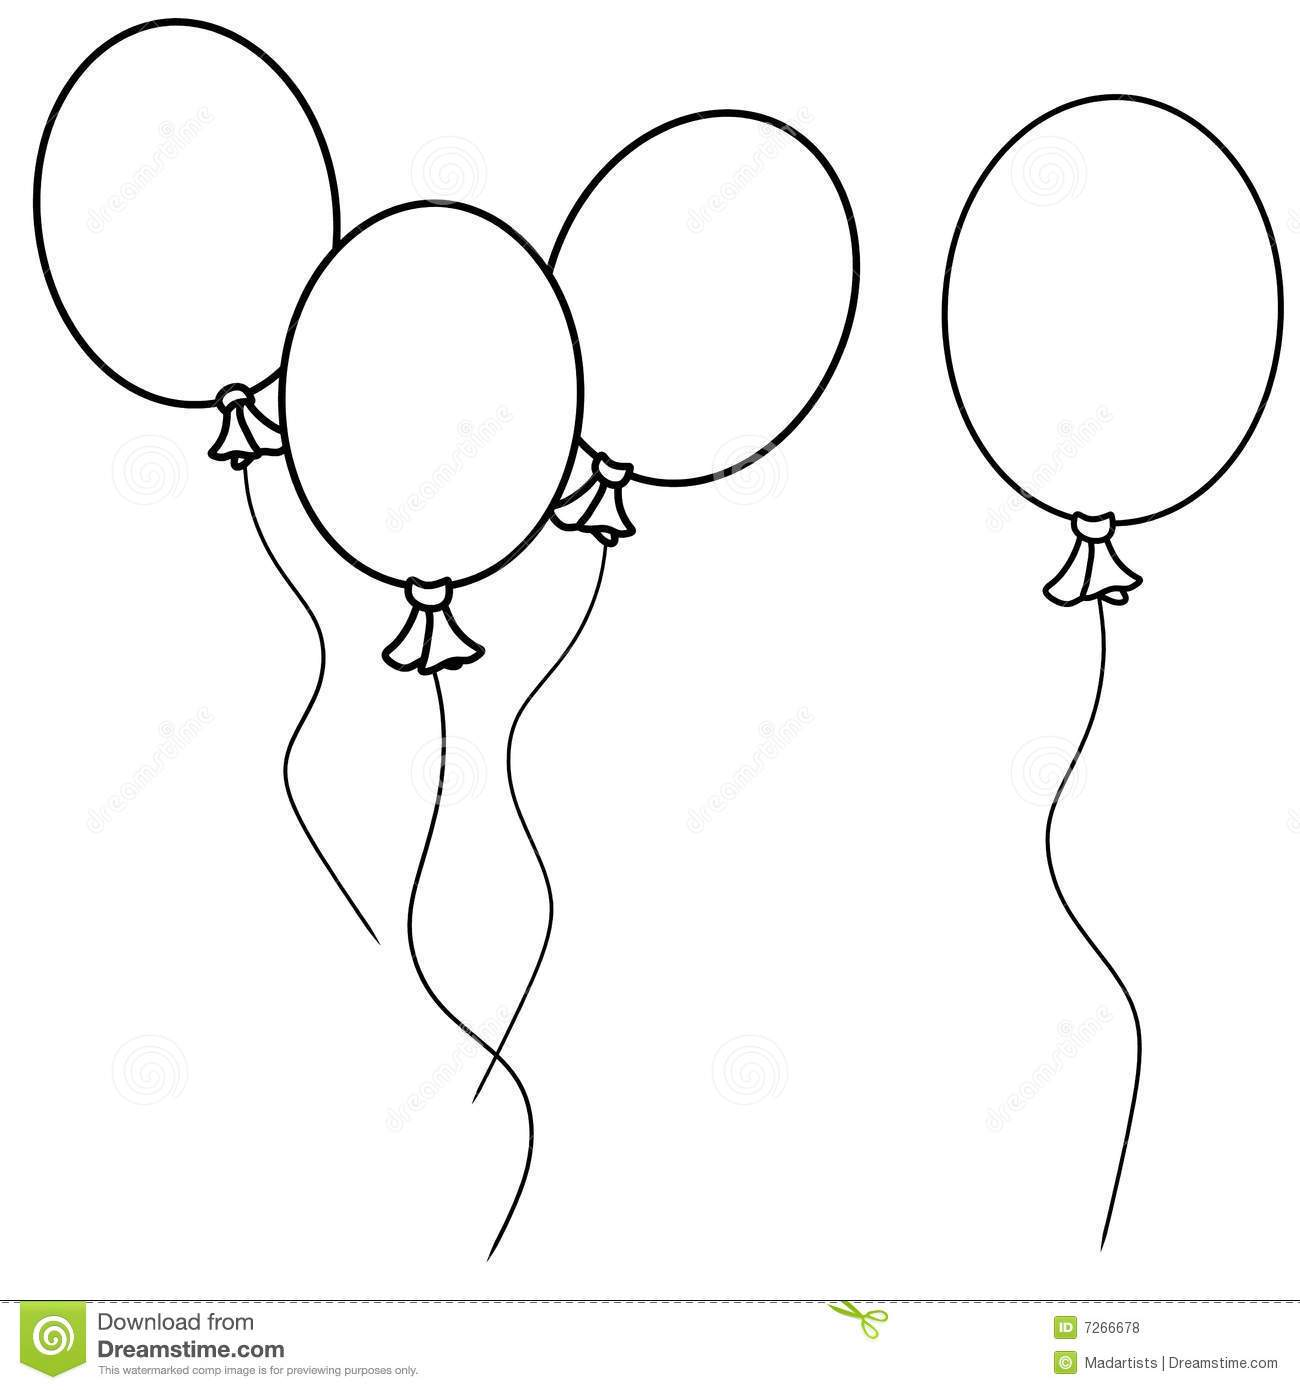 Black and white single balloon clipart 3 » Clipart Portal.